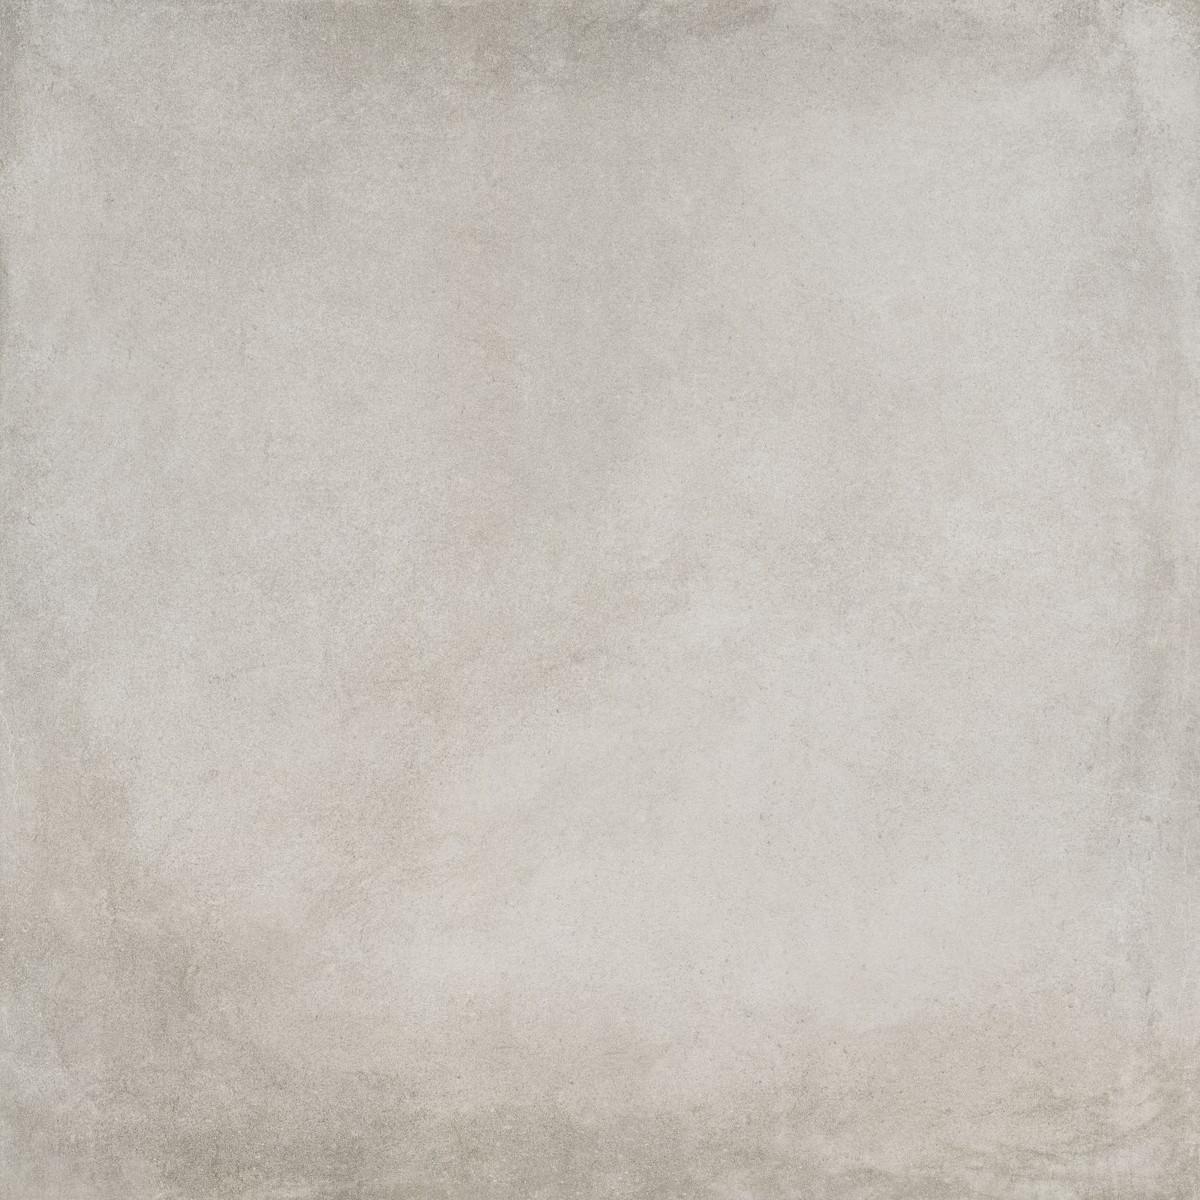 Bodenfliese Gazzini Essential sand 90 x 90 cm – Bild 2